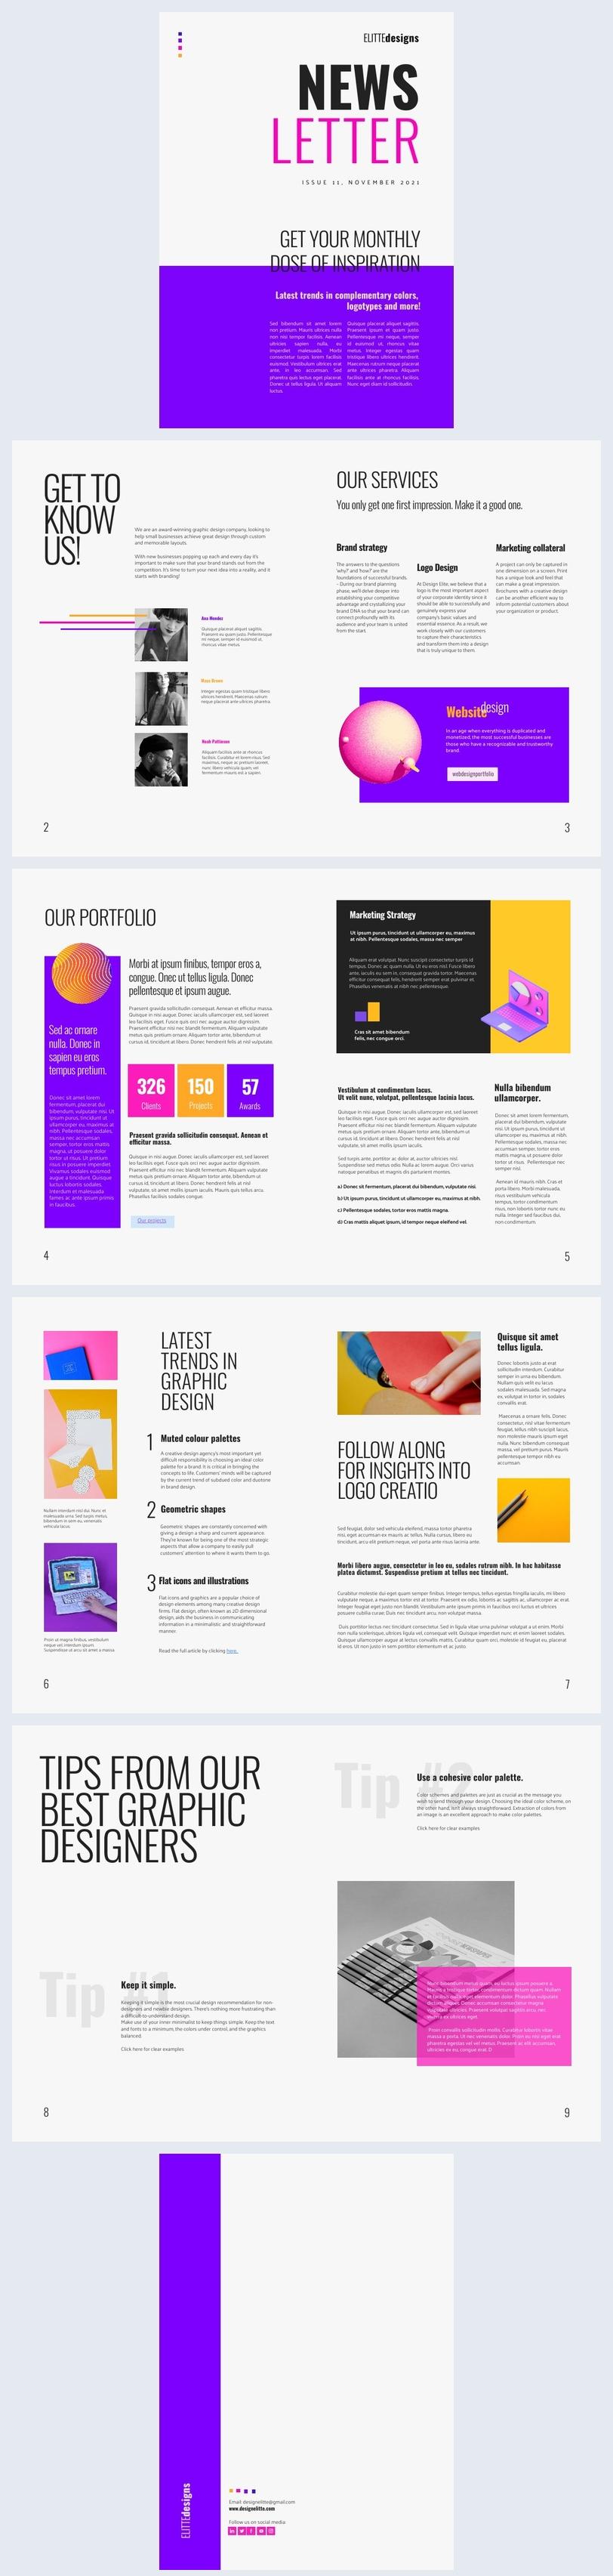 Amostra de Newsletter de Design Gráfico Interativa